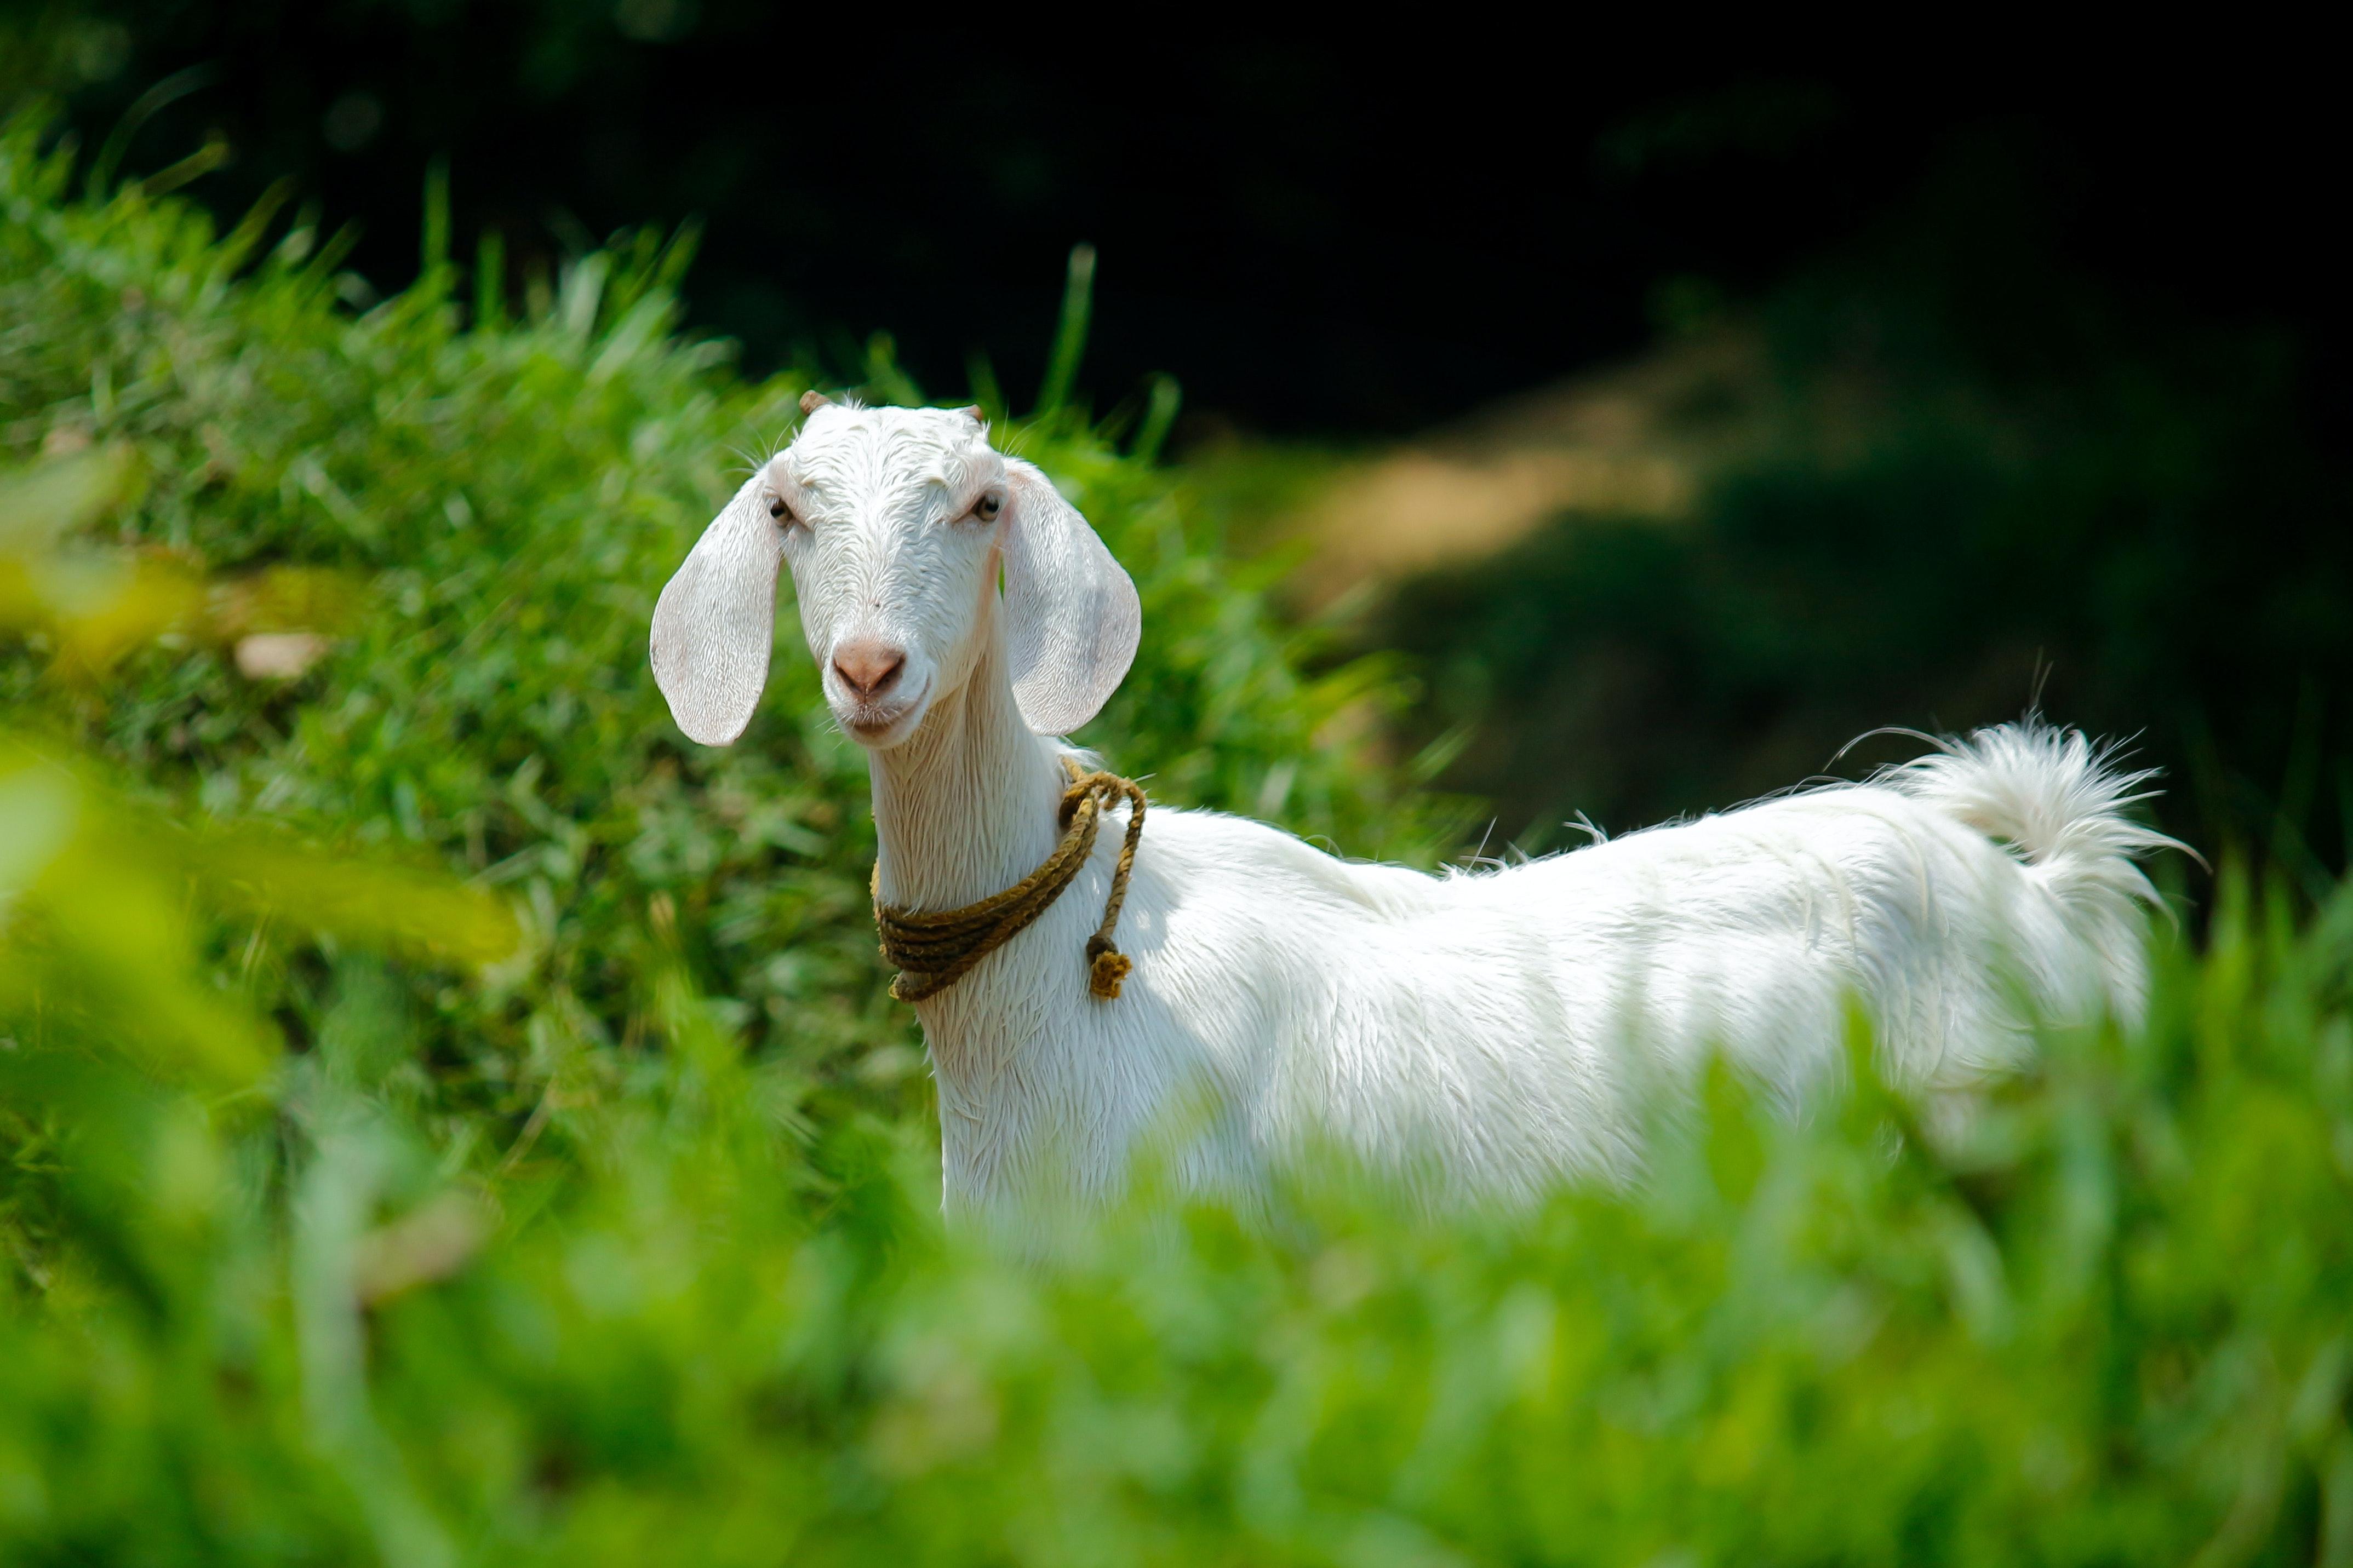 White Goat Eating Grass During Daytime  U00b7 Free Stock Photo